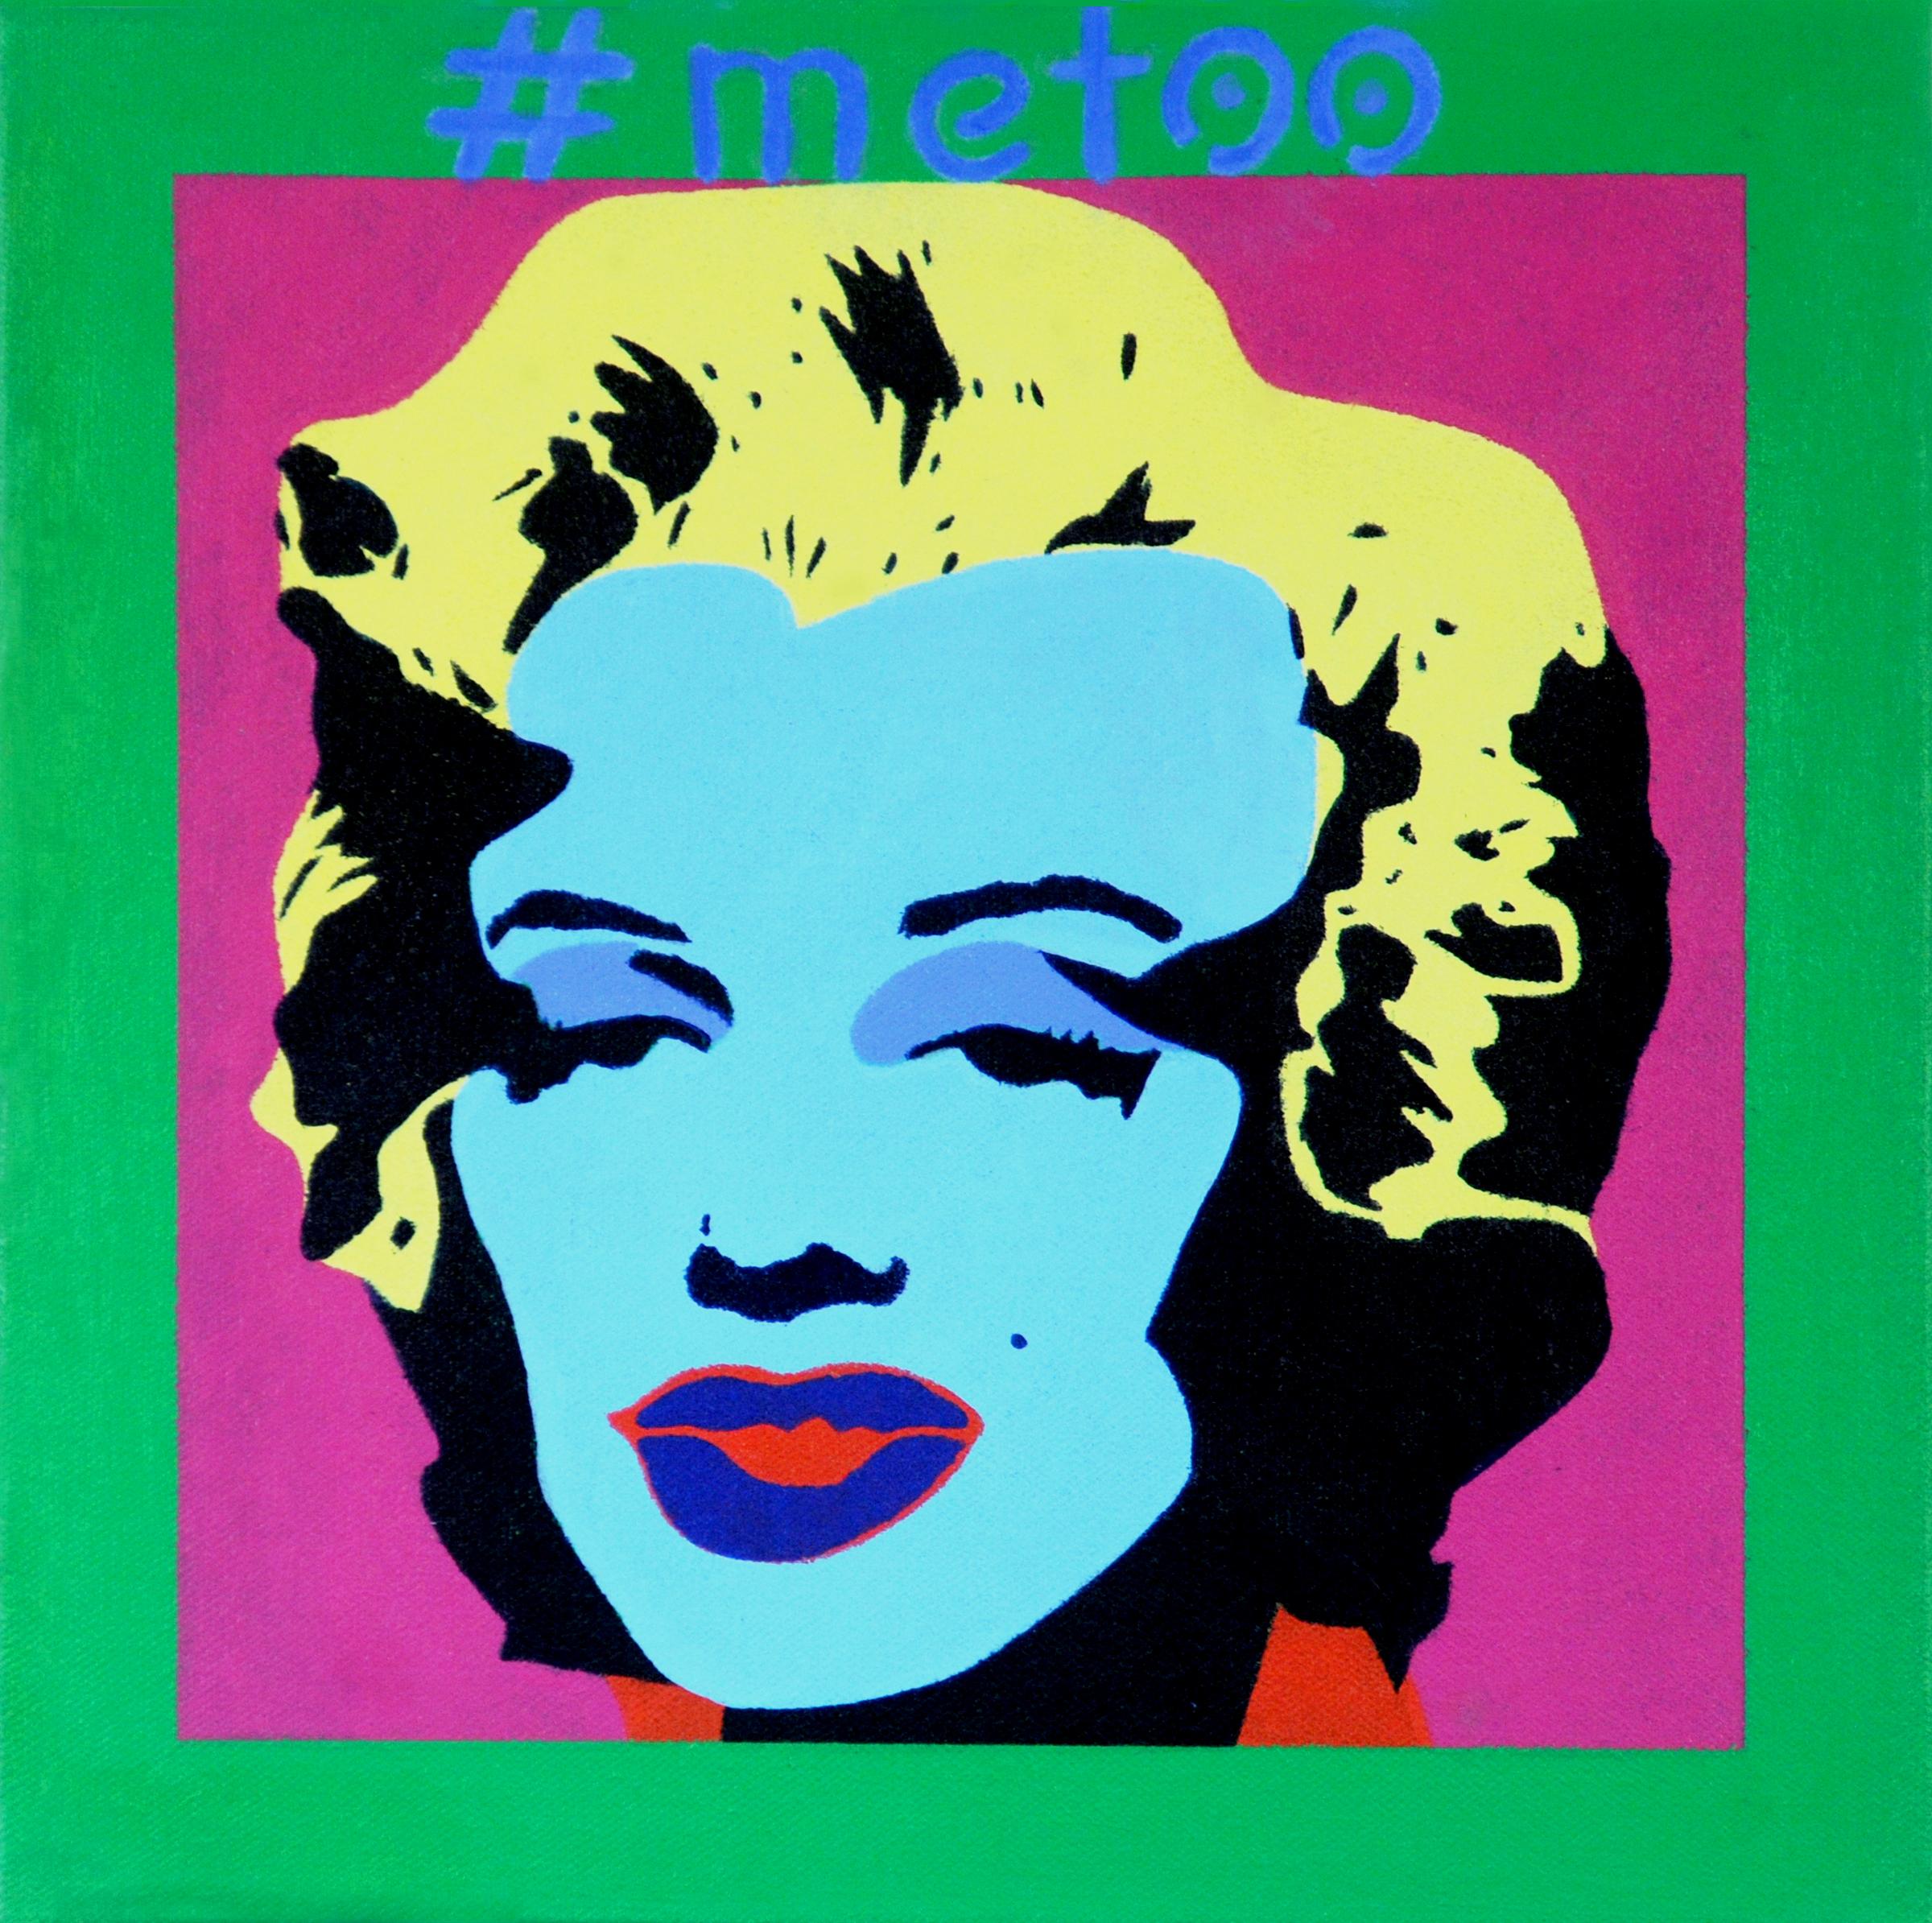 "#MeToo: Marilyn #4. 2018. 12""x12""."